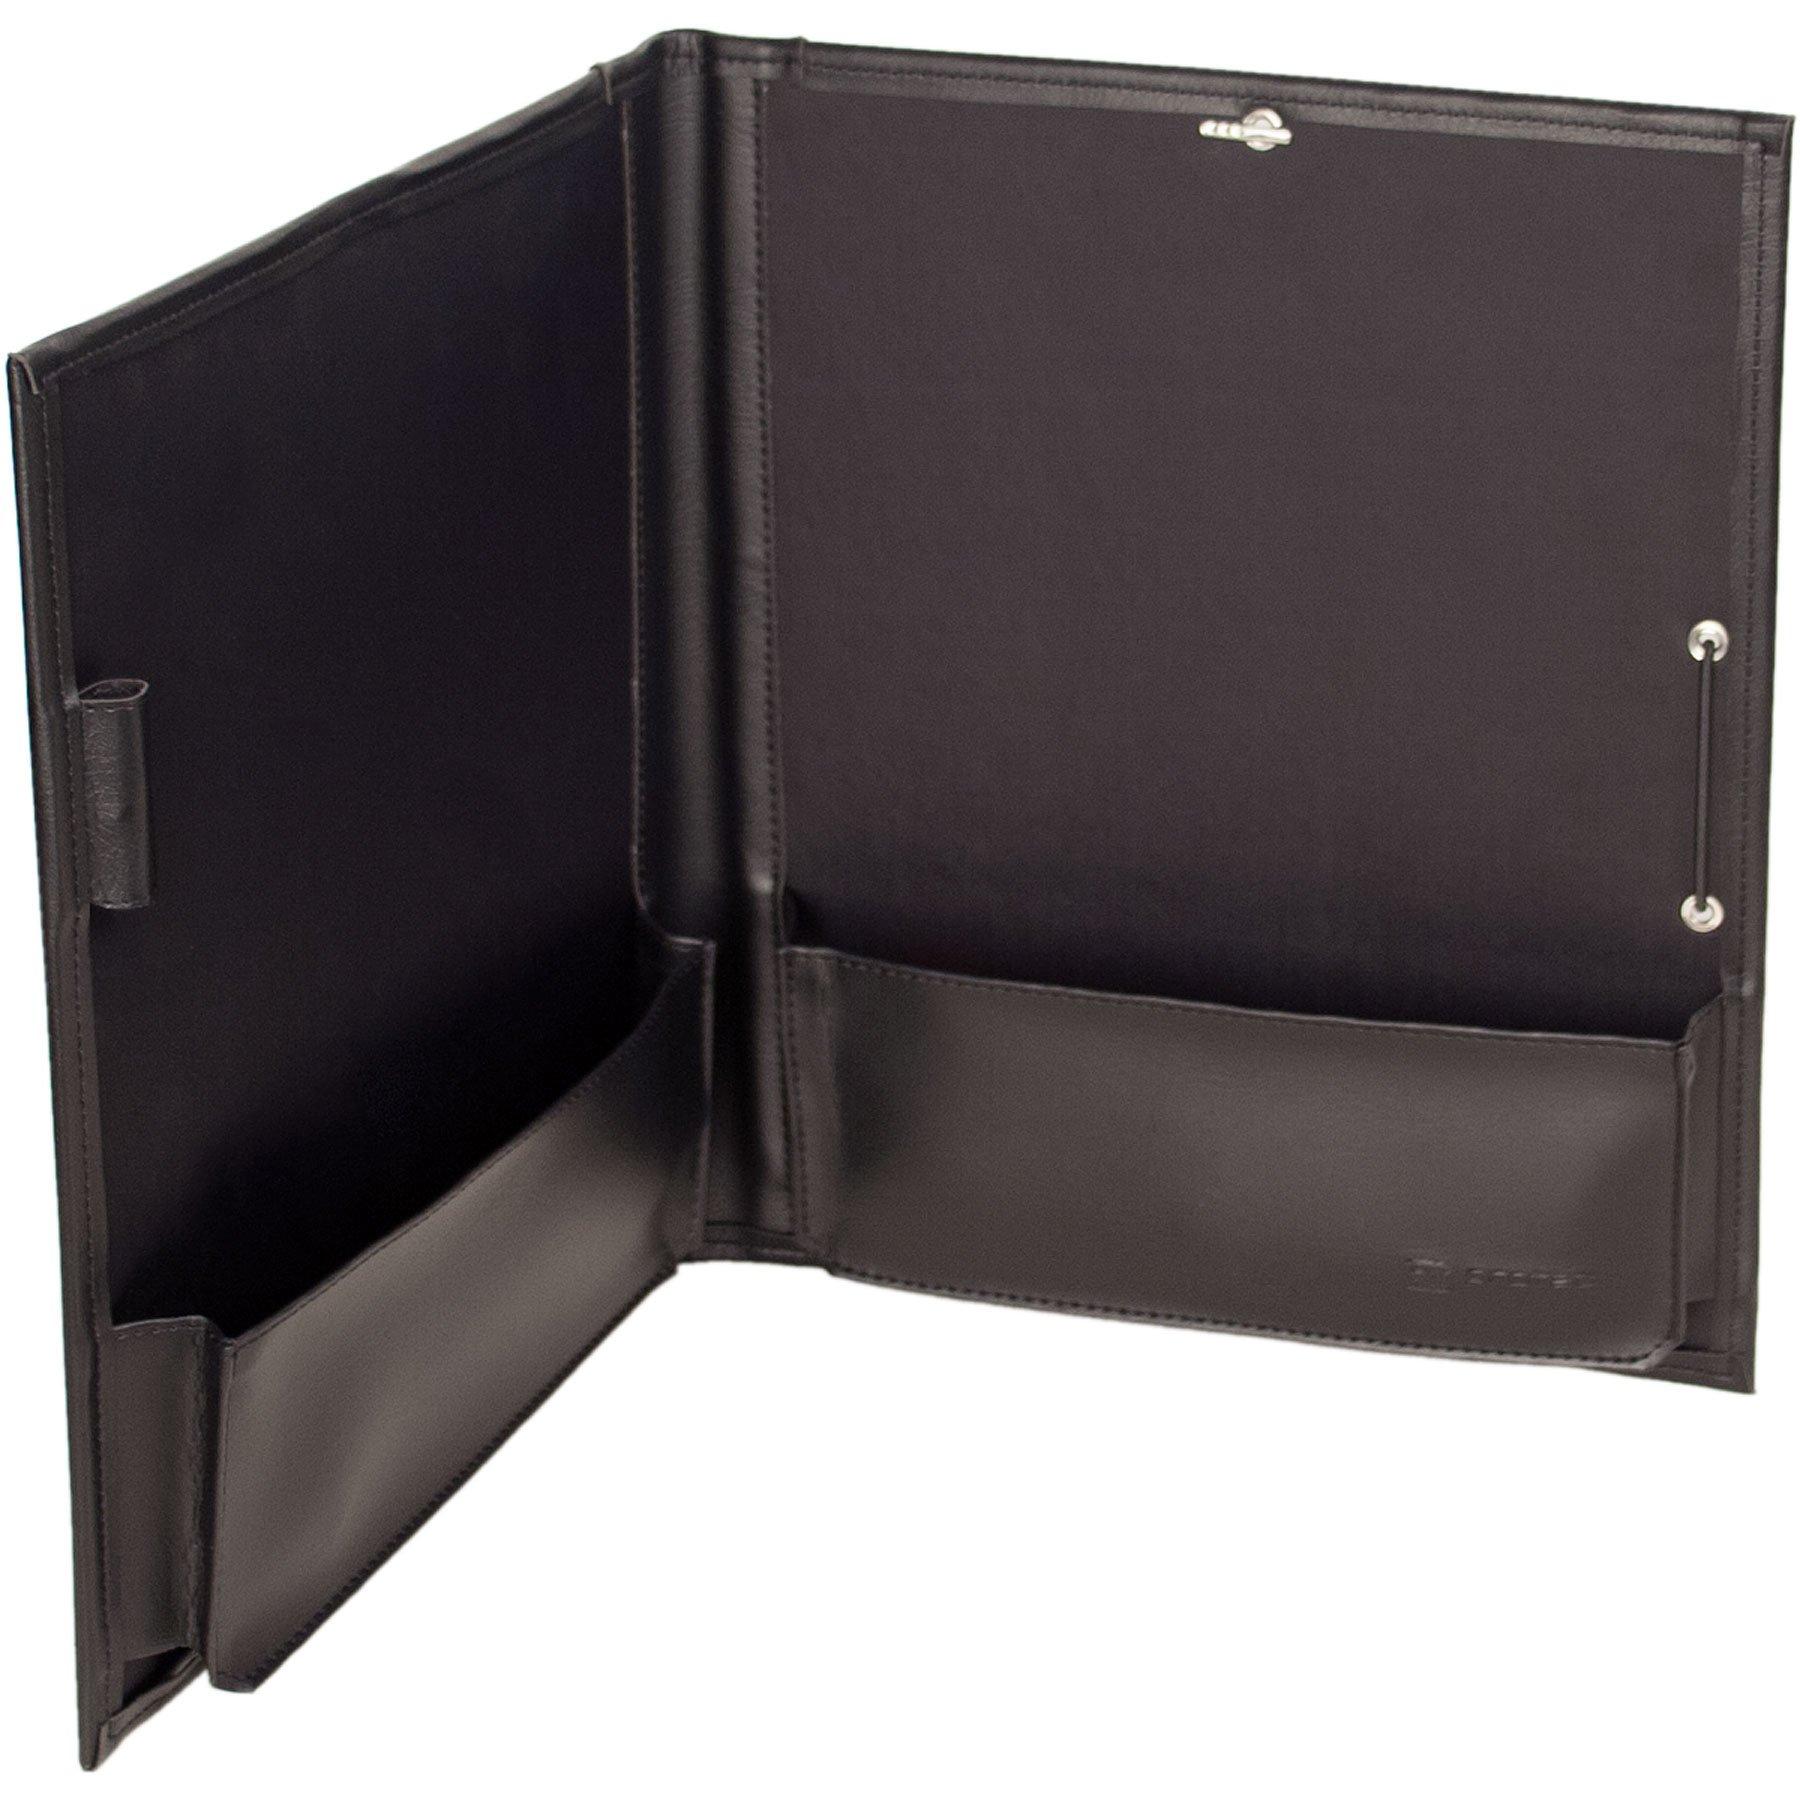 Protec Standard Sheet Music Folder with Elastic Band Closure, Model F2E